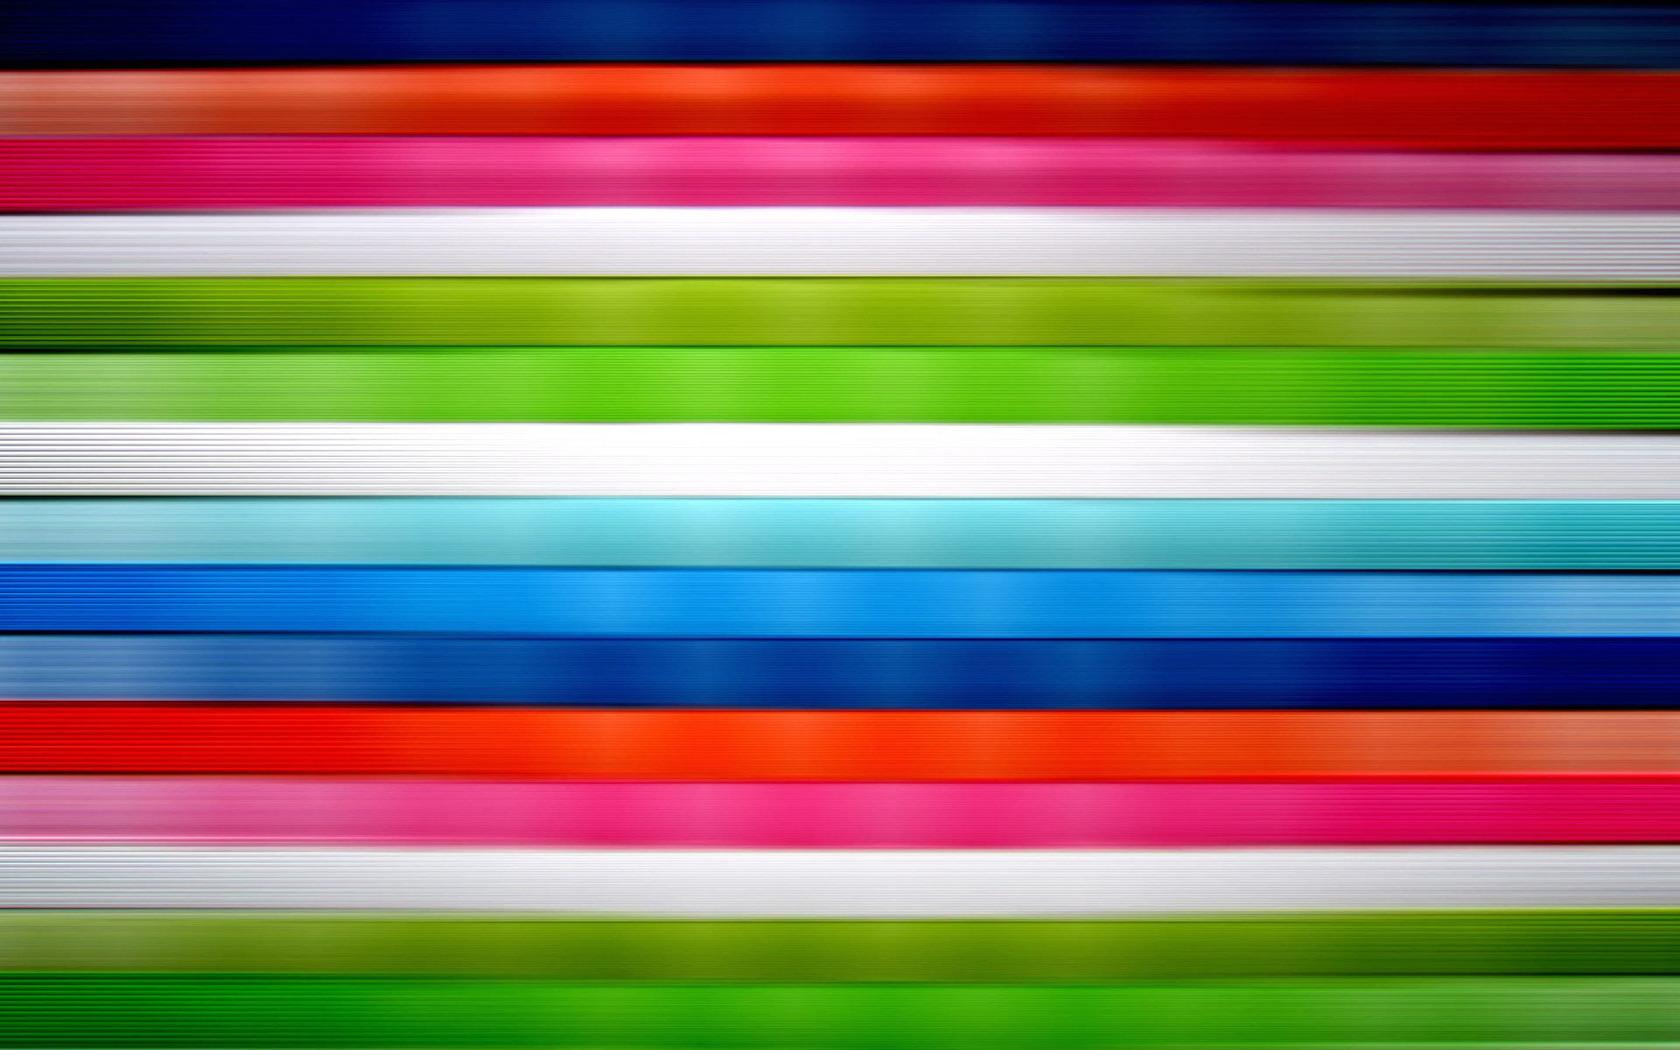 Download Horizontal vivid colored stripes wallpaper 1680x1050